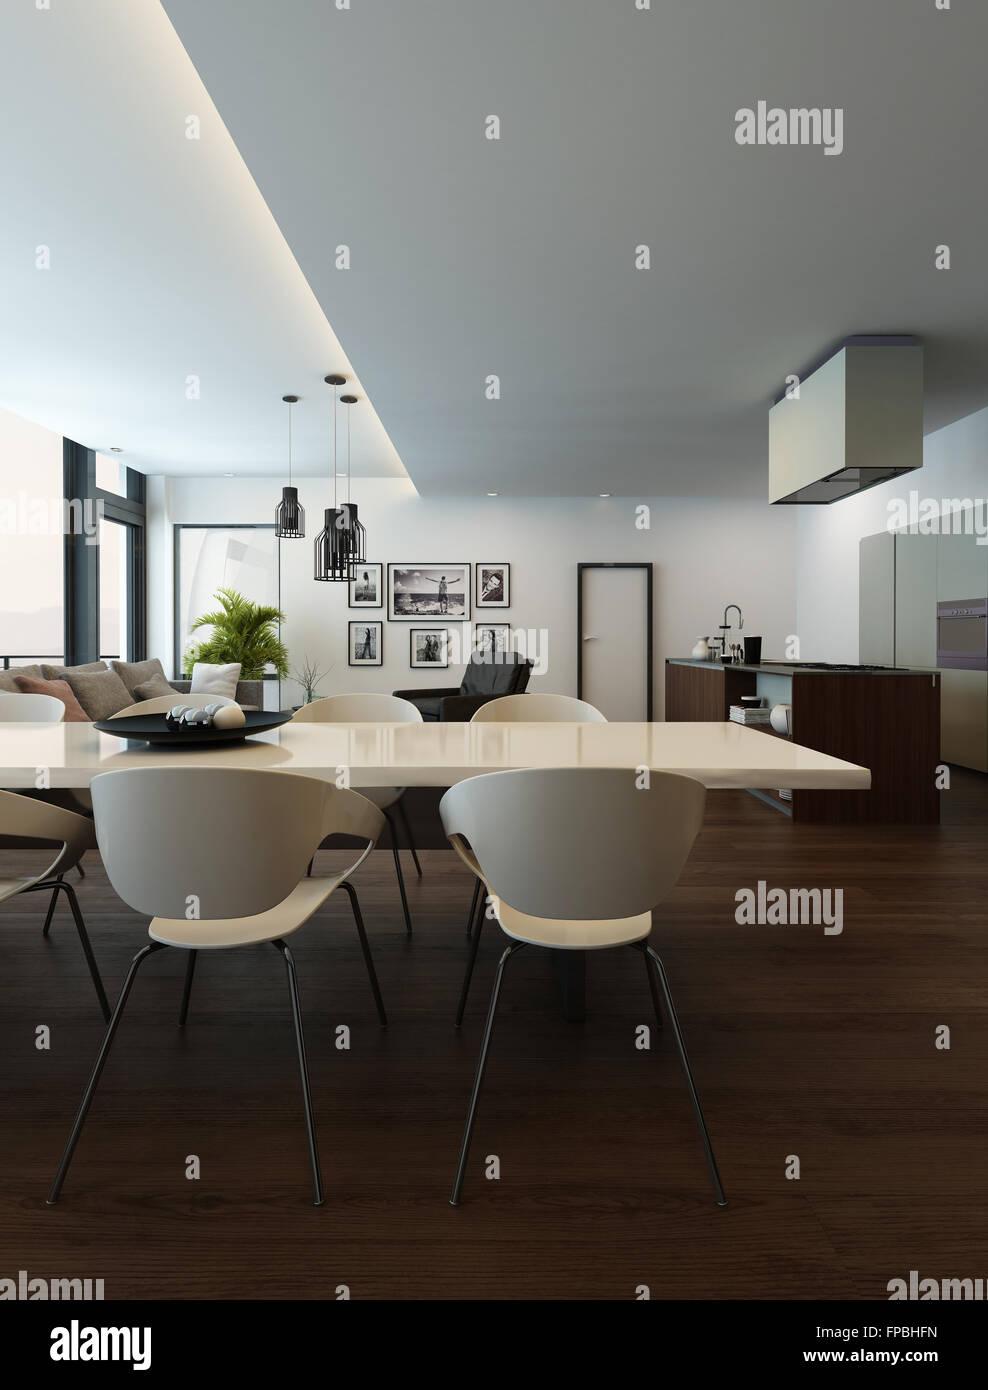 Syunpuu.com = Fensterdeko Gardinen Ideen Fur Licht Im Duschbereich ...